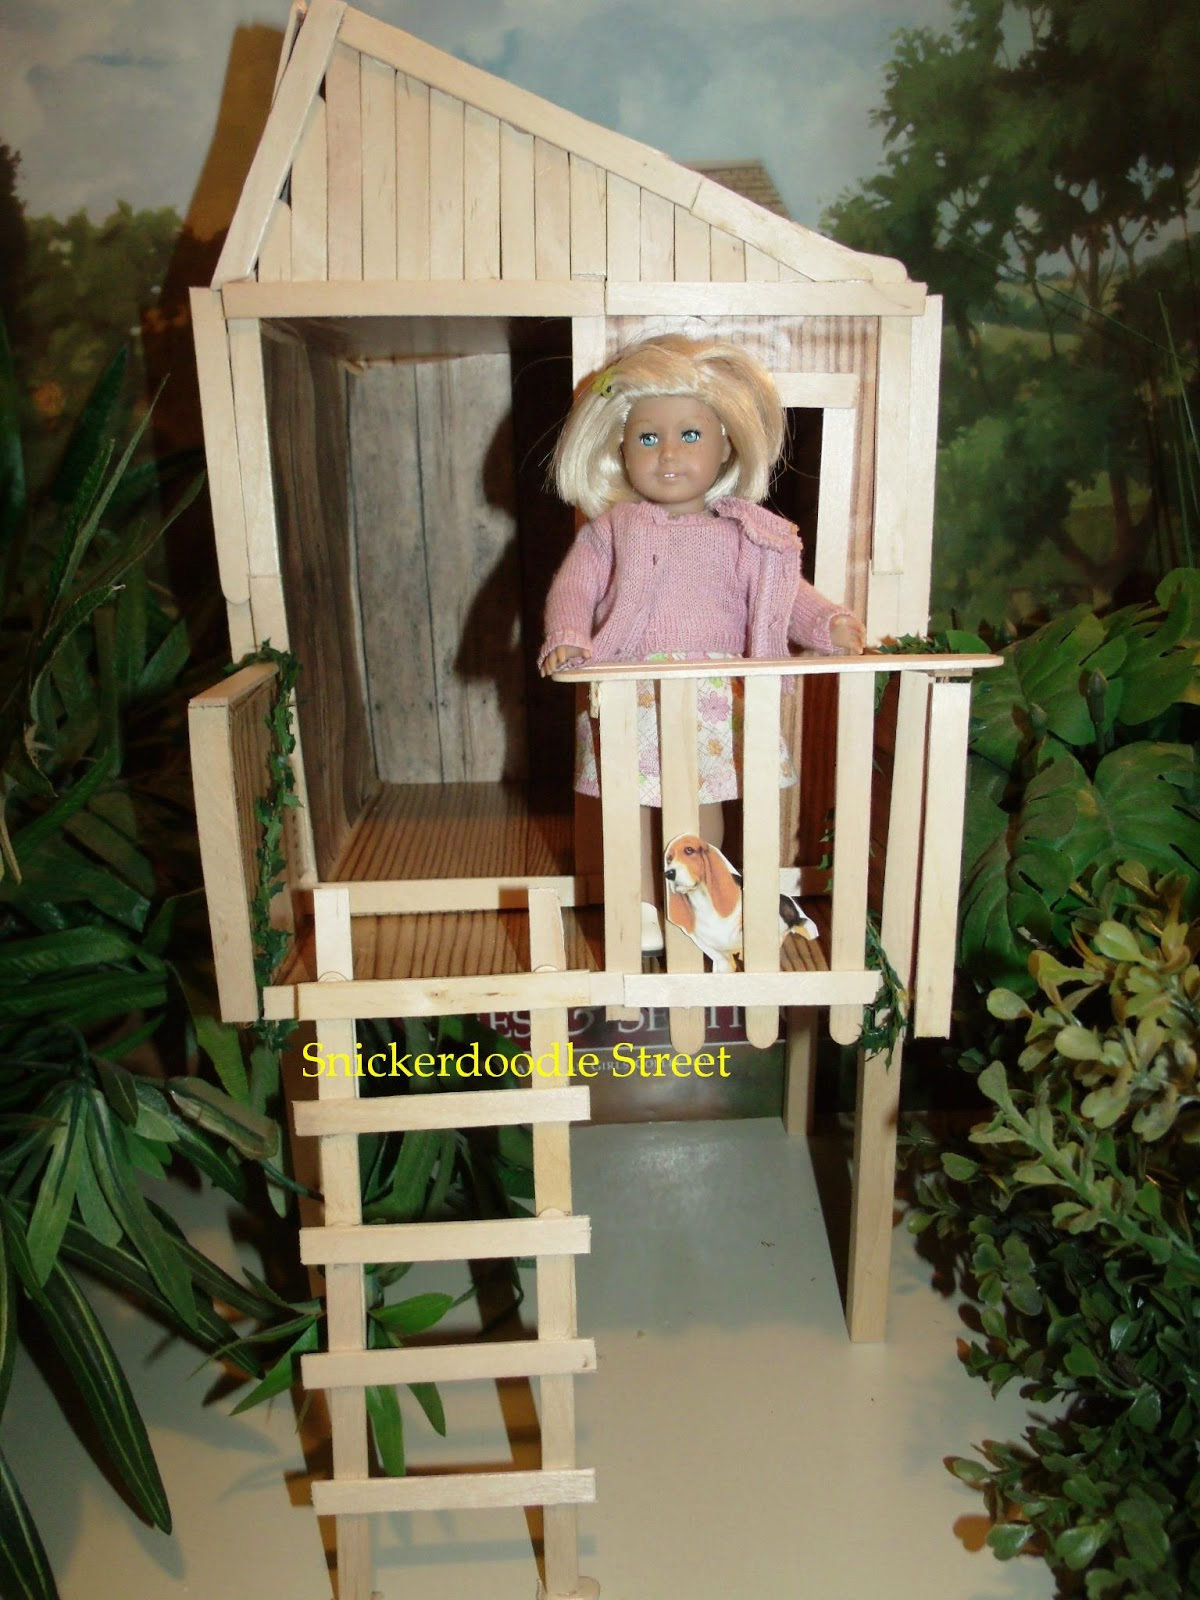 Snickerdoodle Street How To Make Mini Kit S Tree House